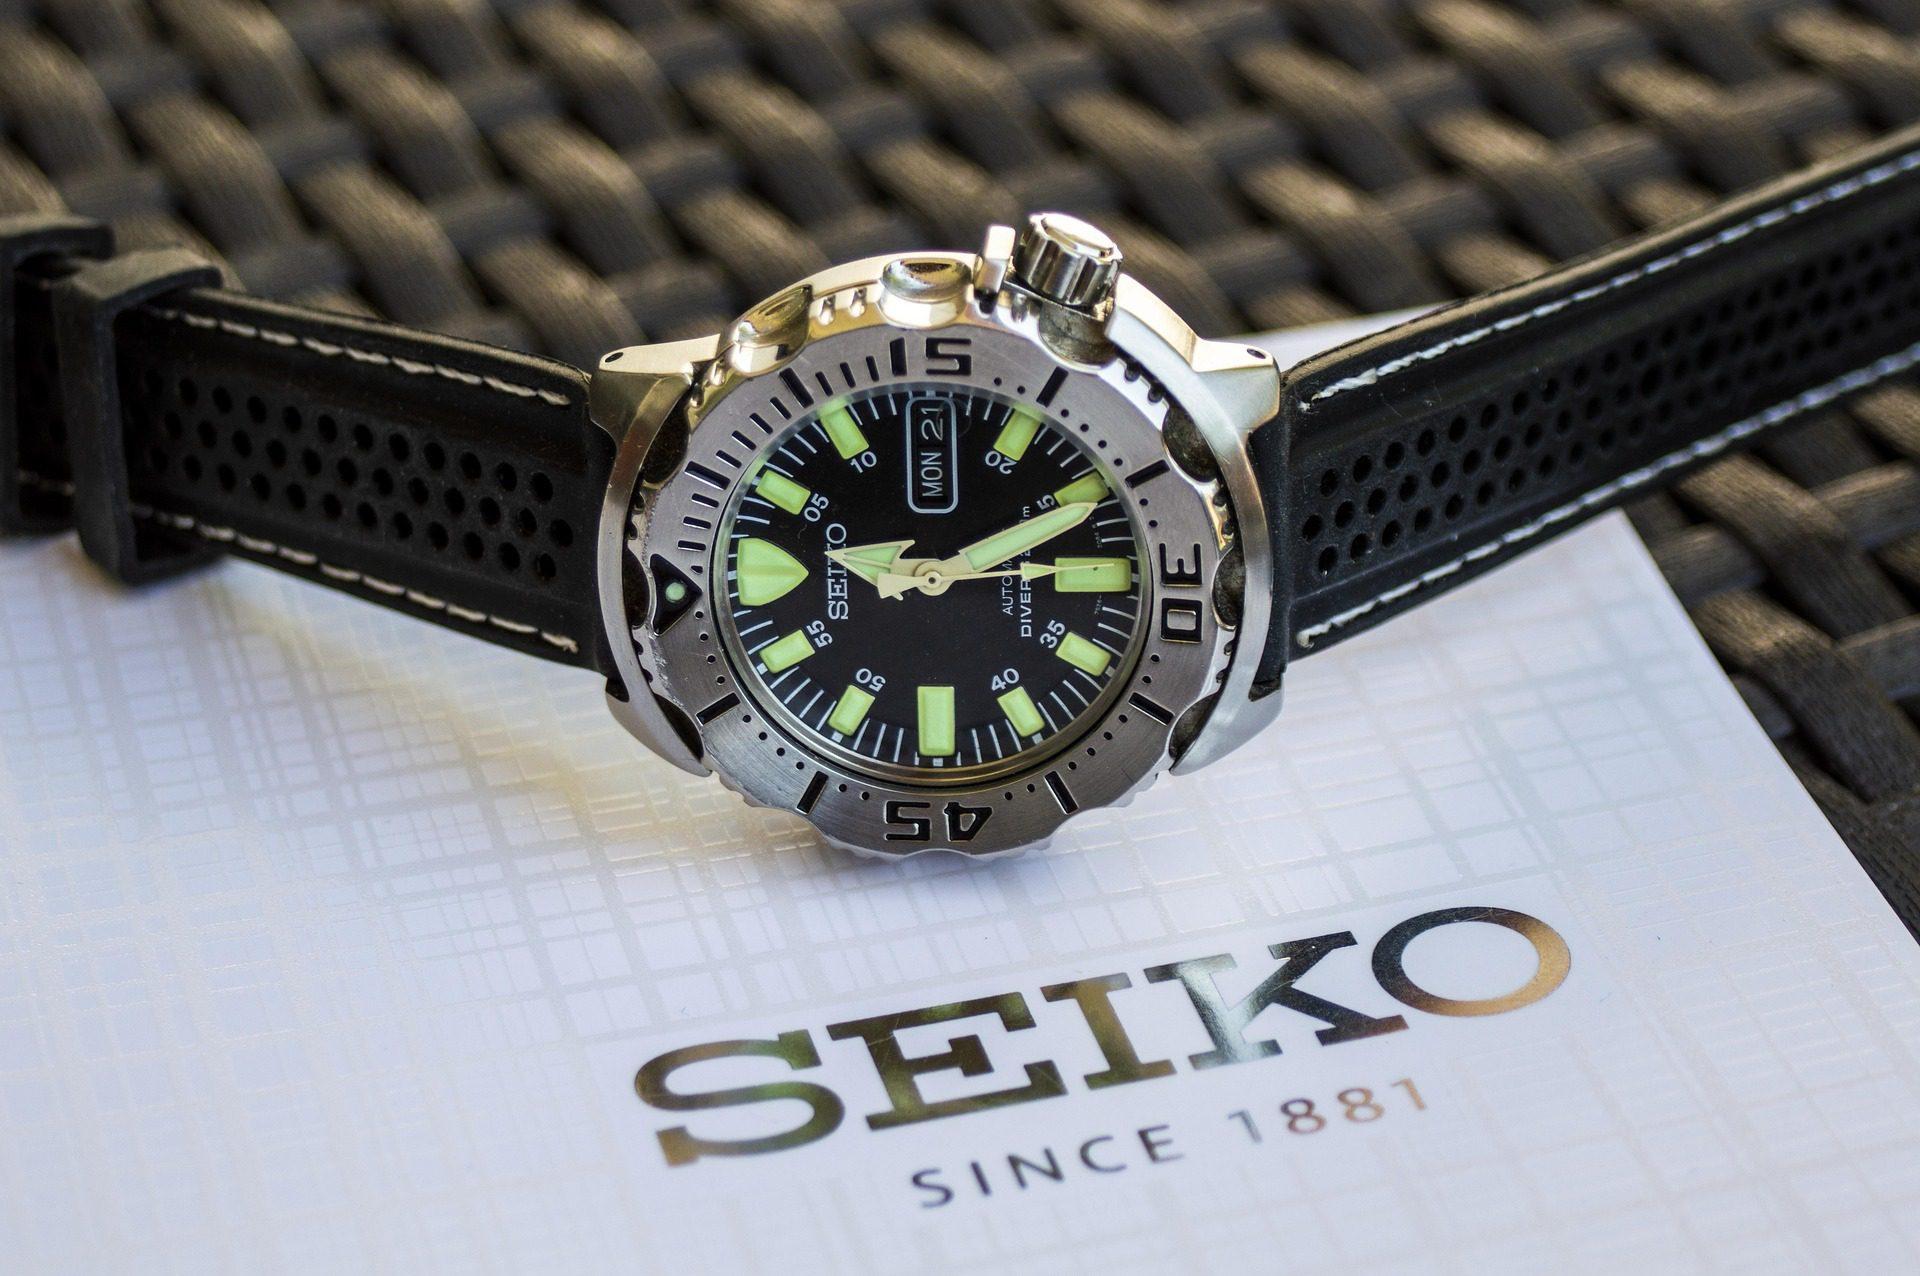 Is the Seiko Presage Watch worth it?